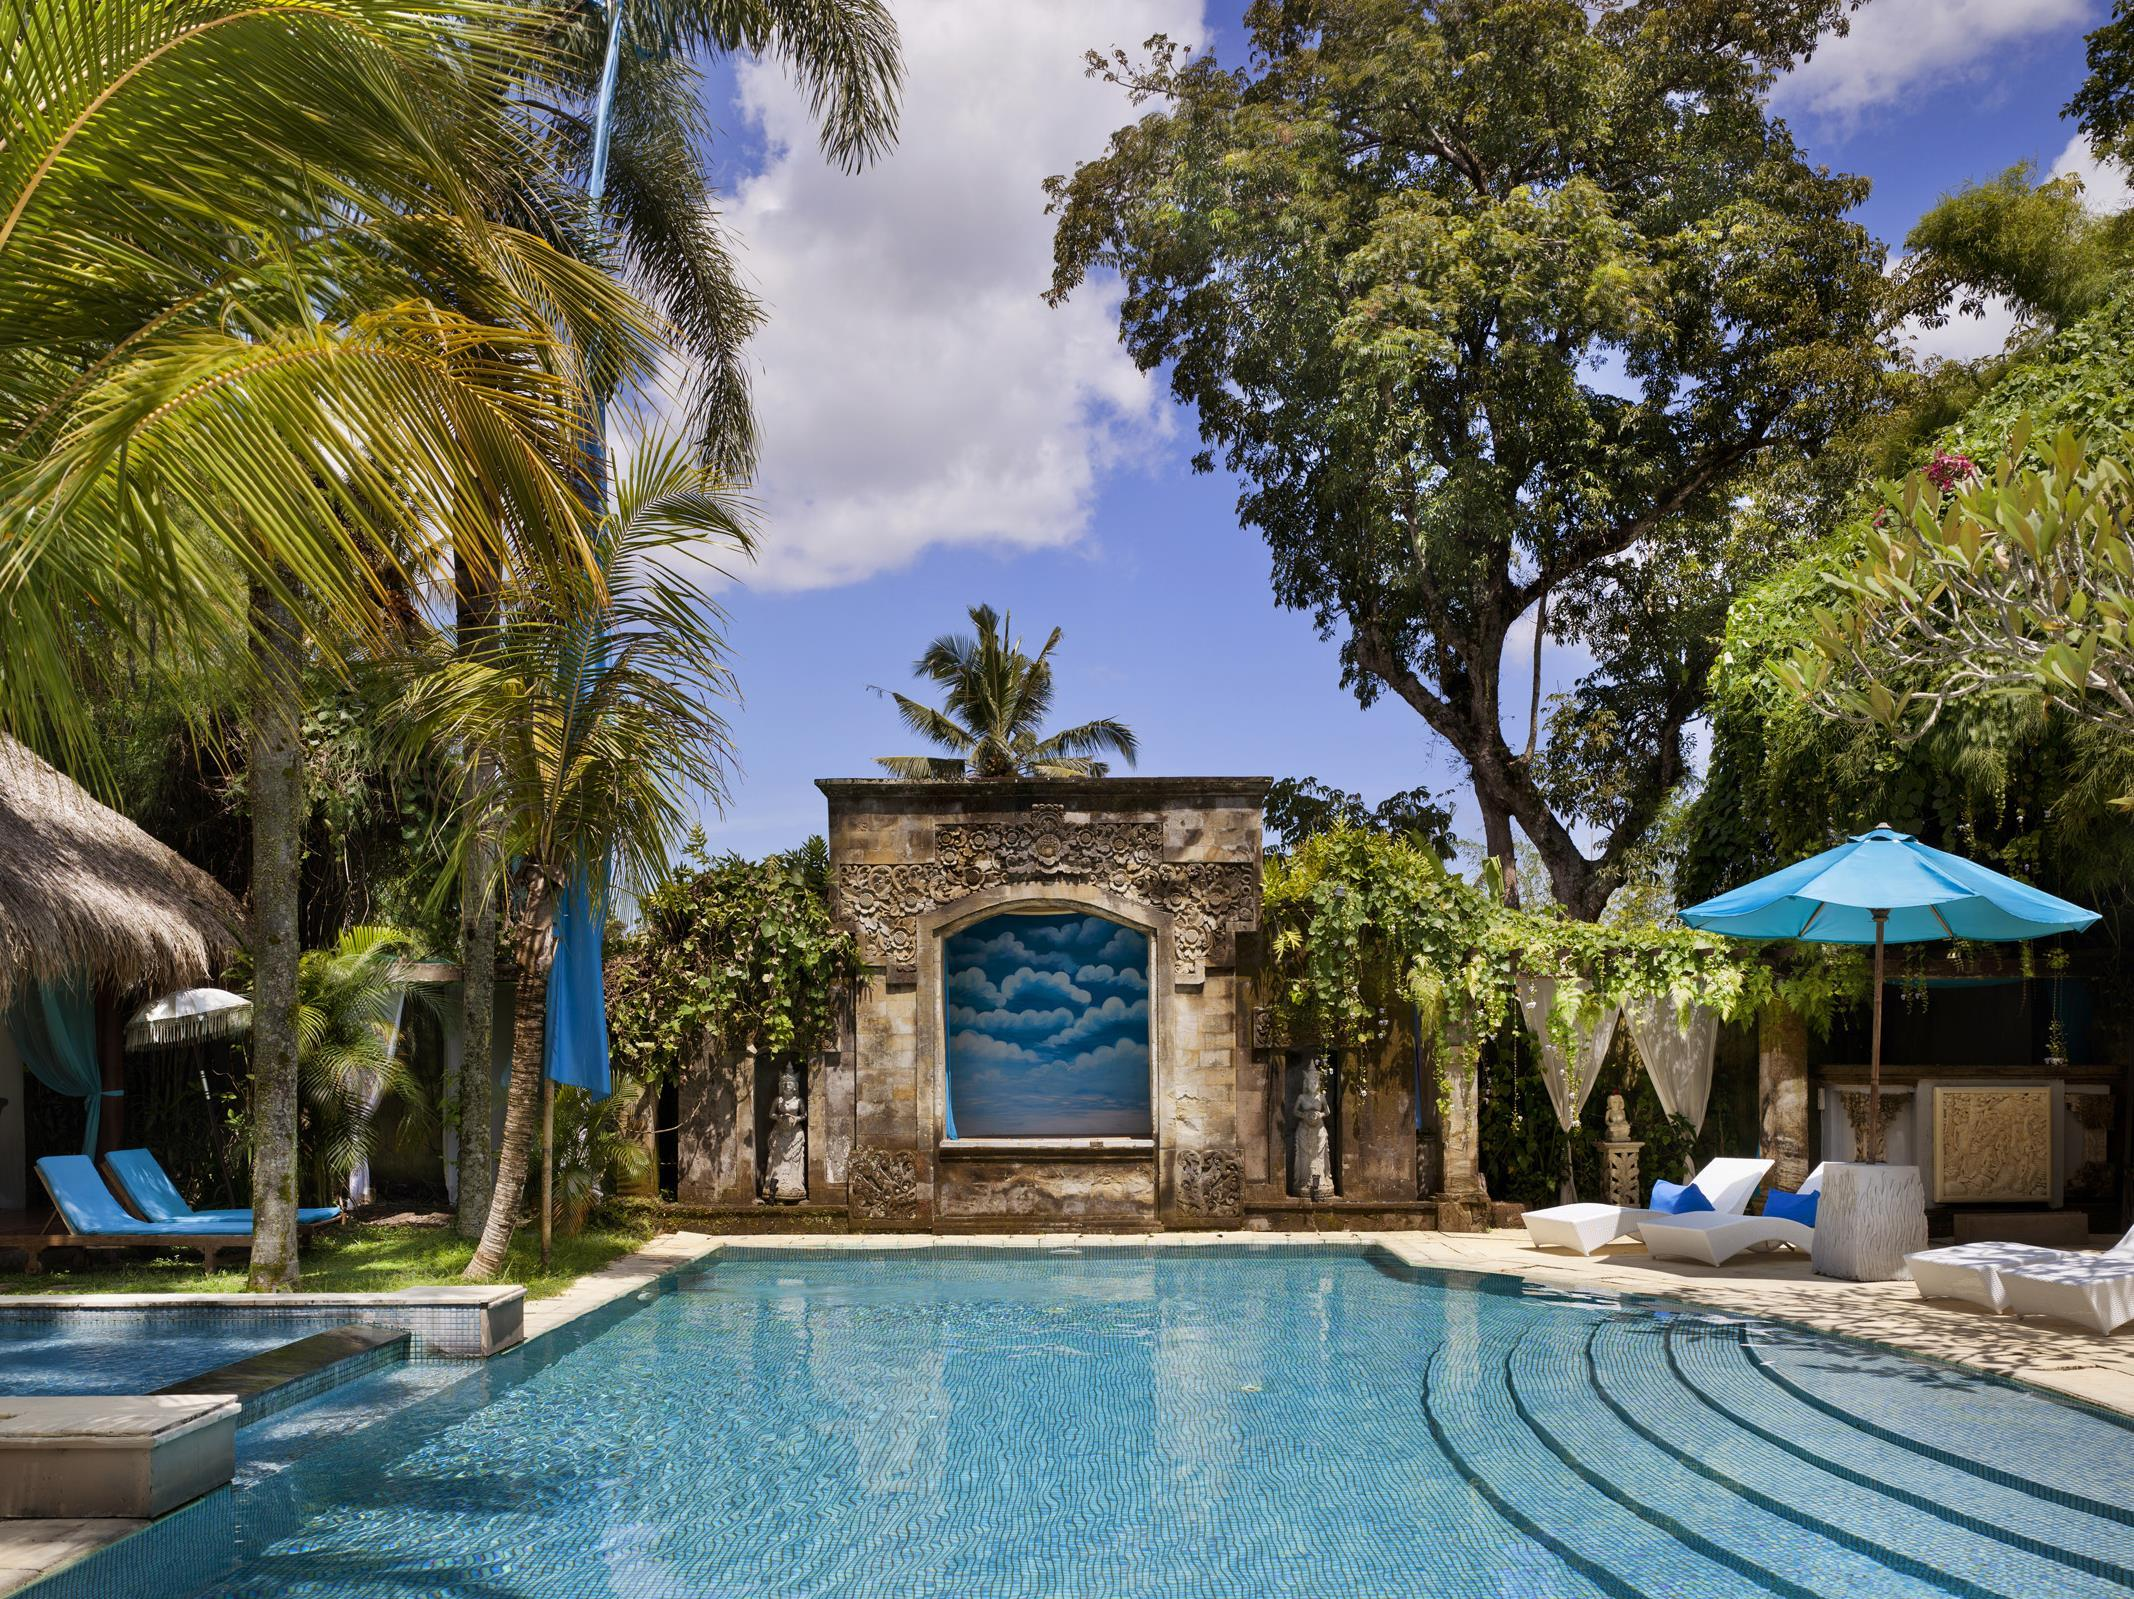 Baliwood Resort - The Mansion ホテル詳細